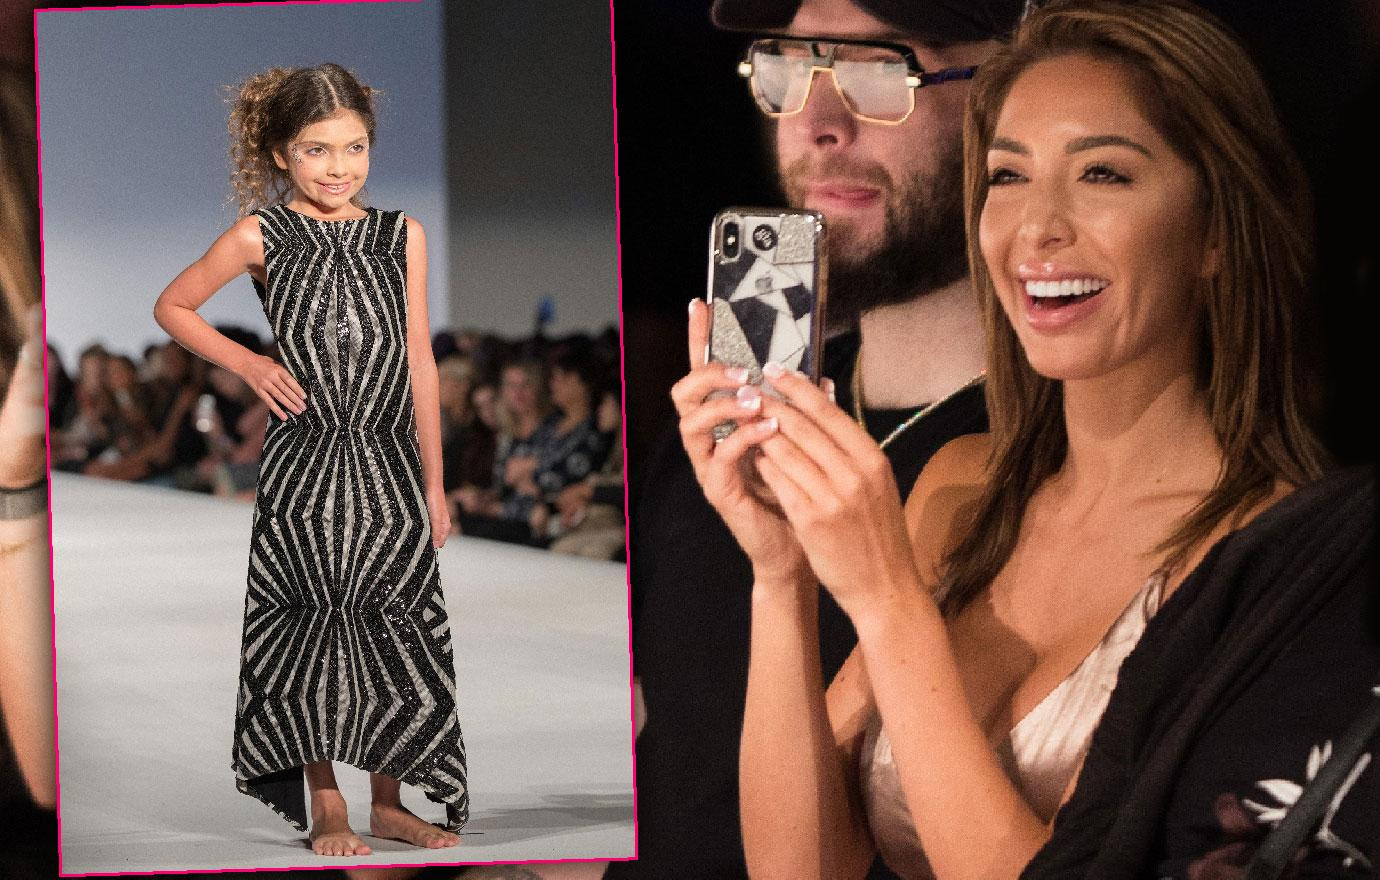 Farrah Abraham Watches Daughter Model At Fashion Show